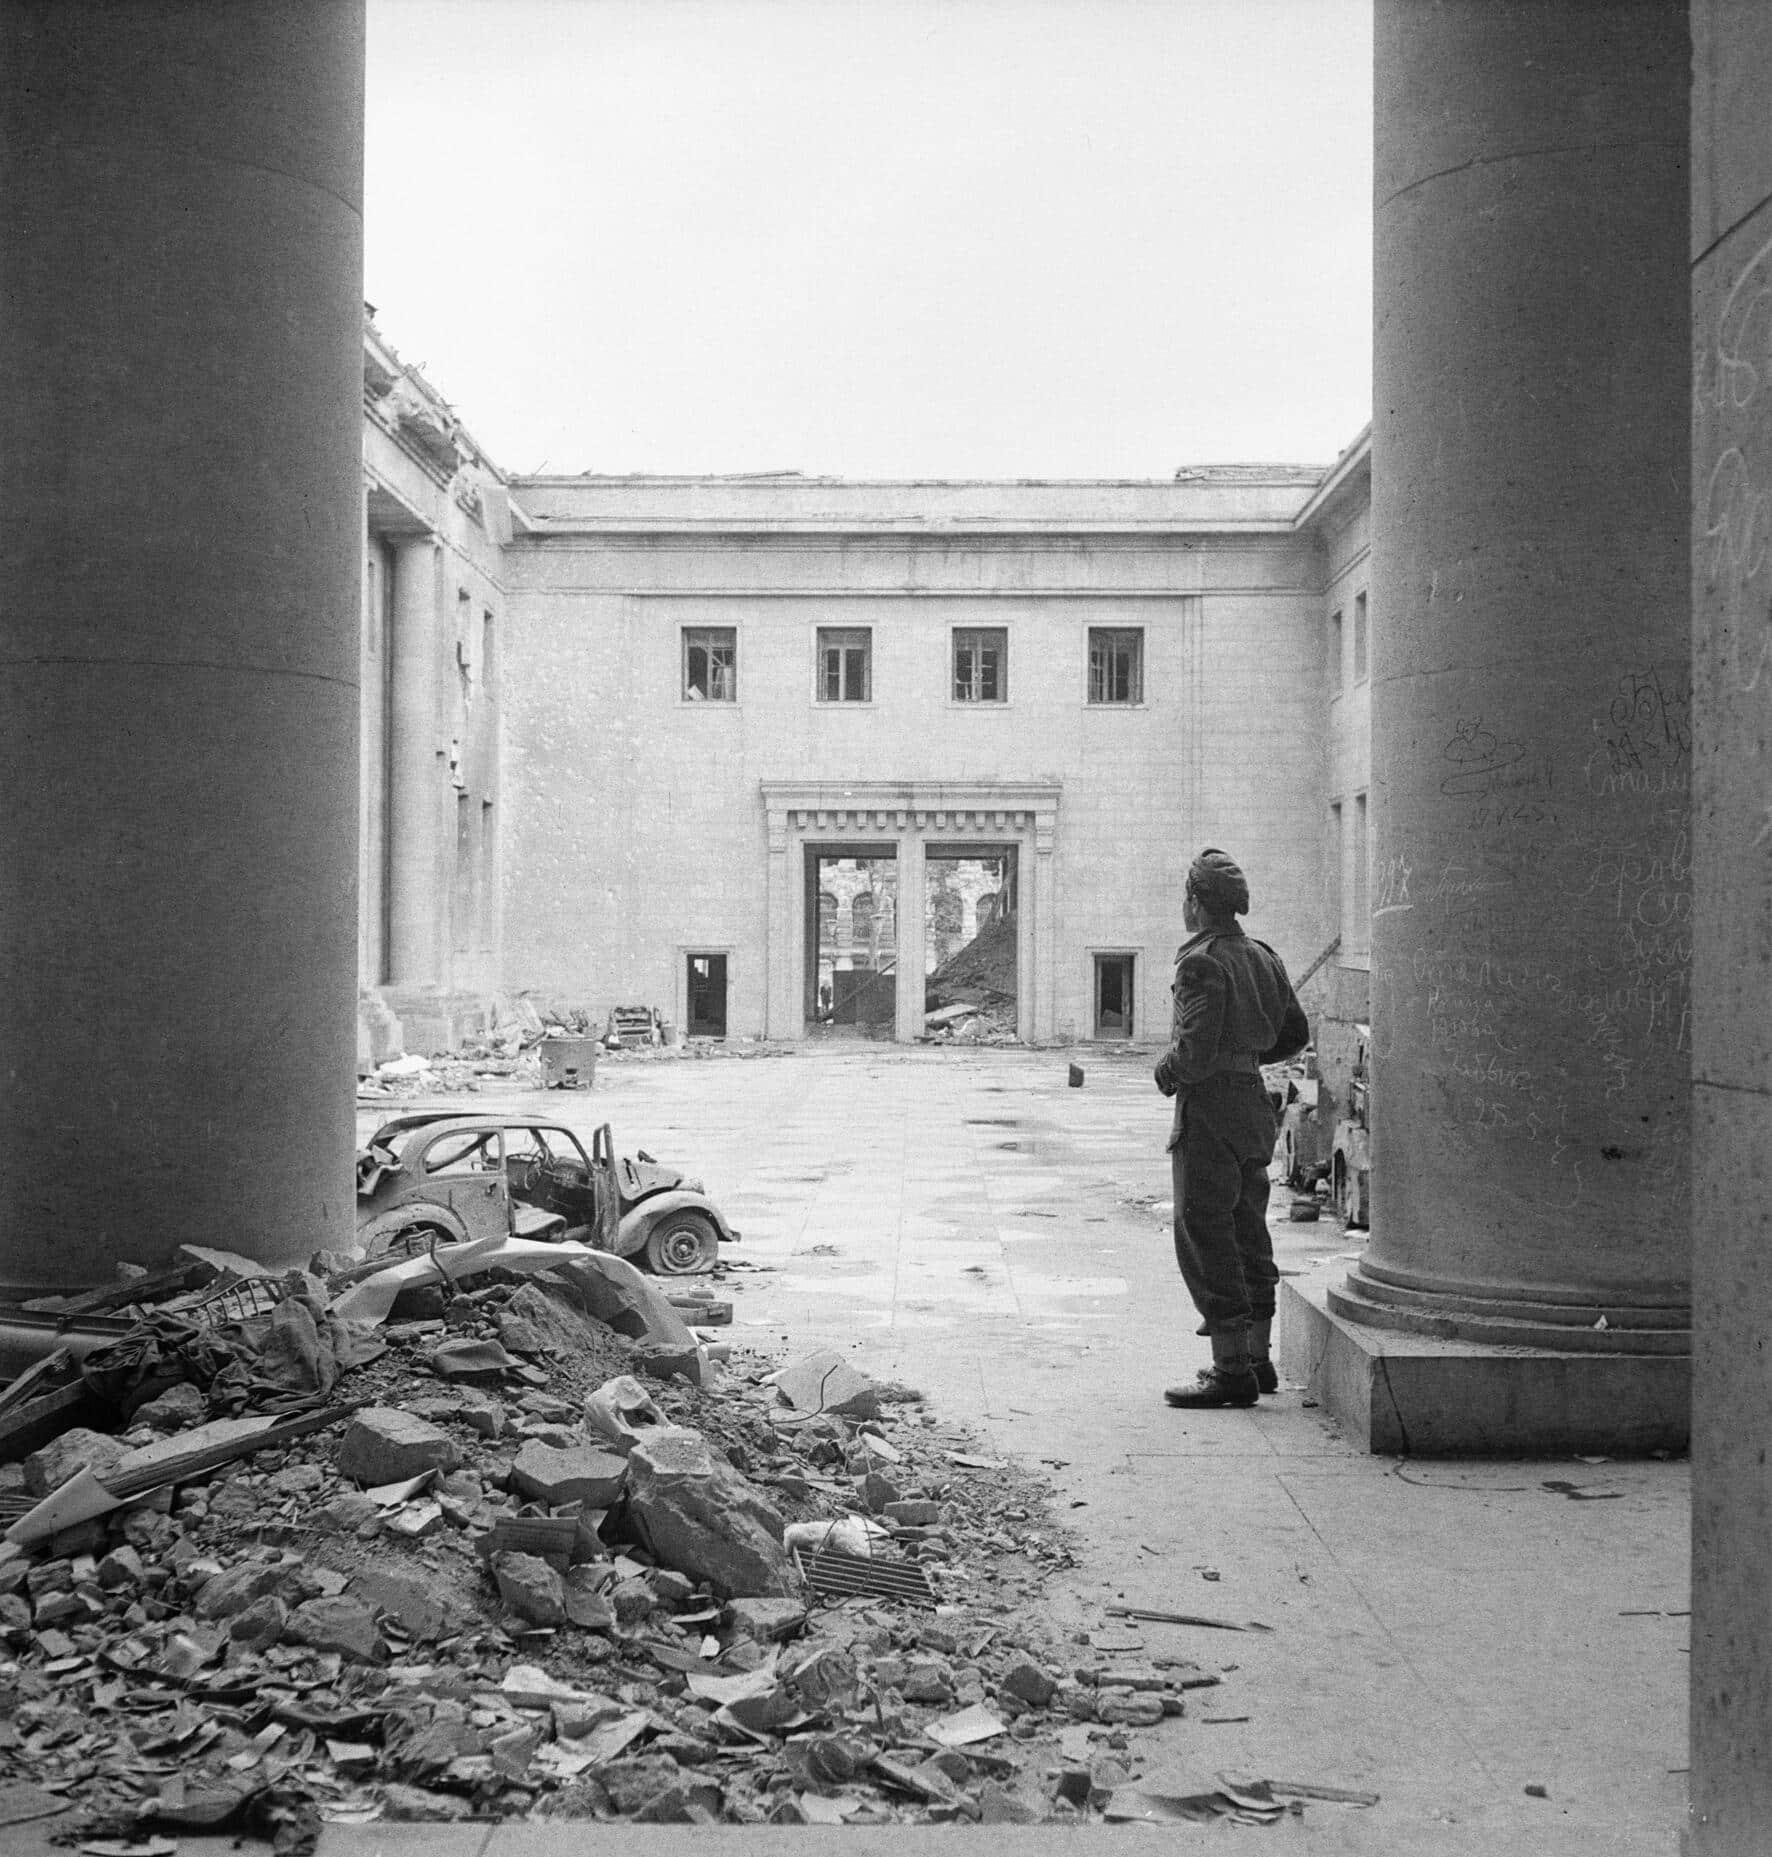 Hitler's Reich Chancellery in Berlin - 1945